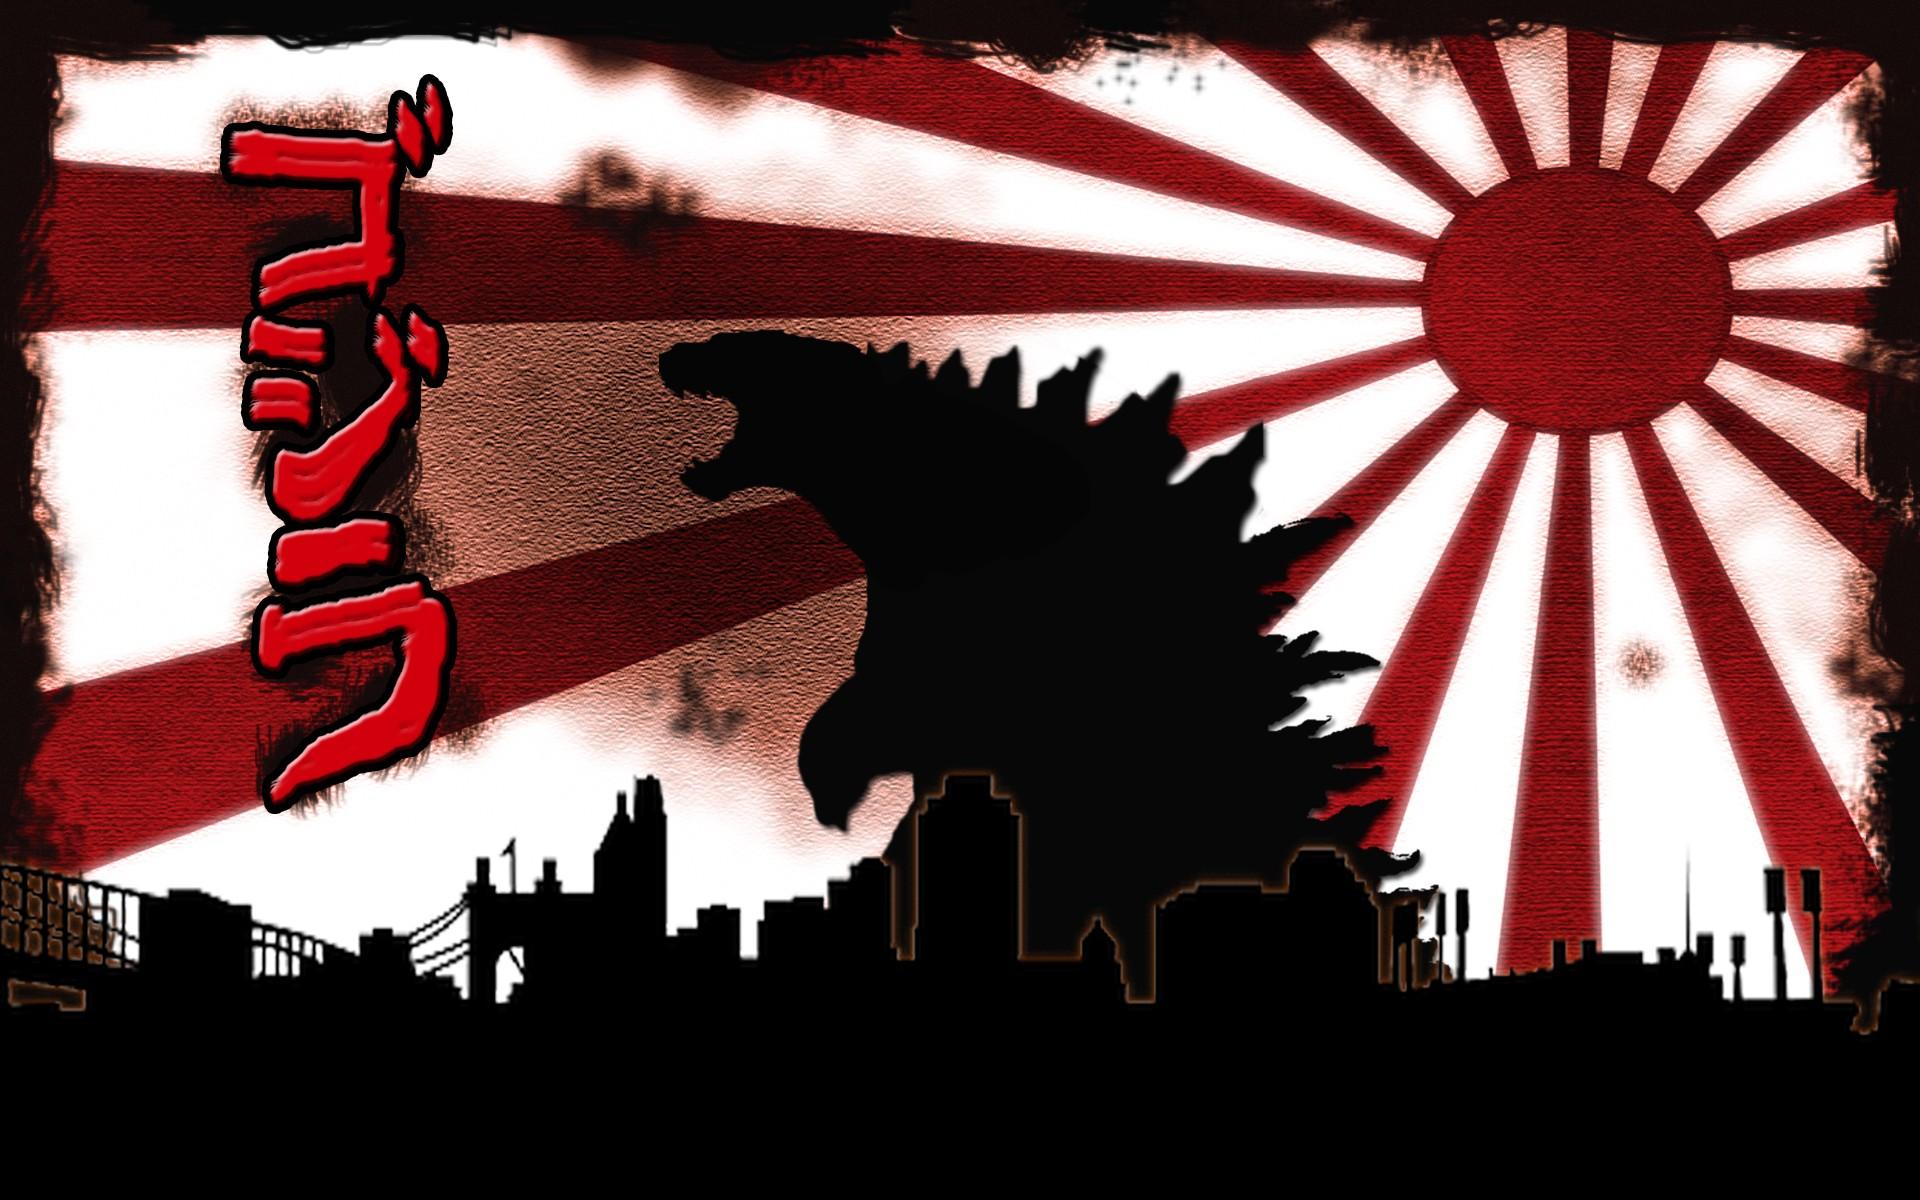 wallpaper : illustration, red, poster, kaiju, godzilla, art, games